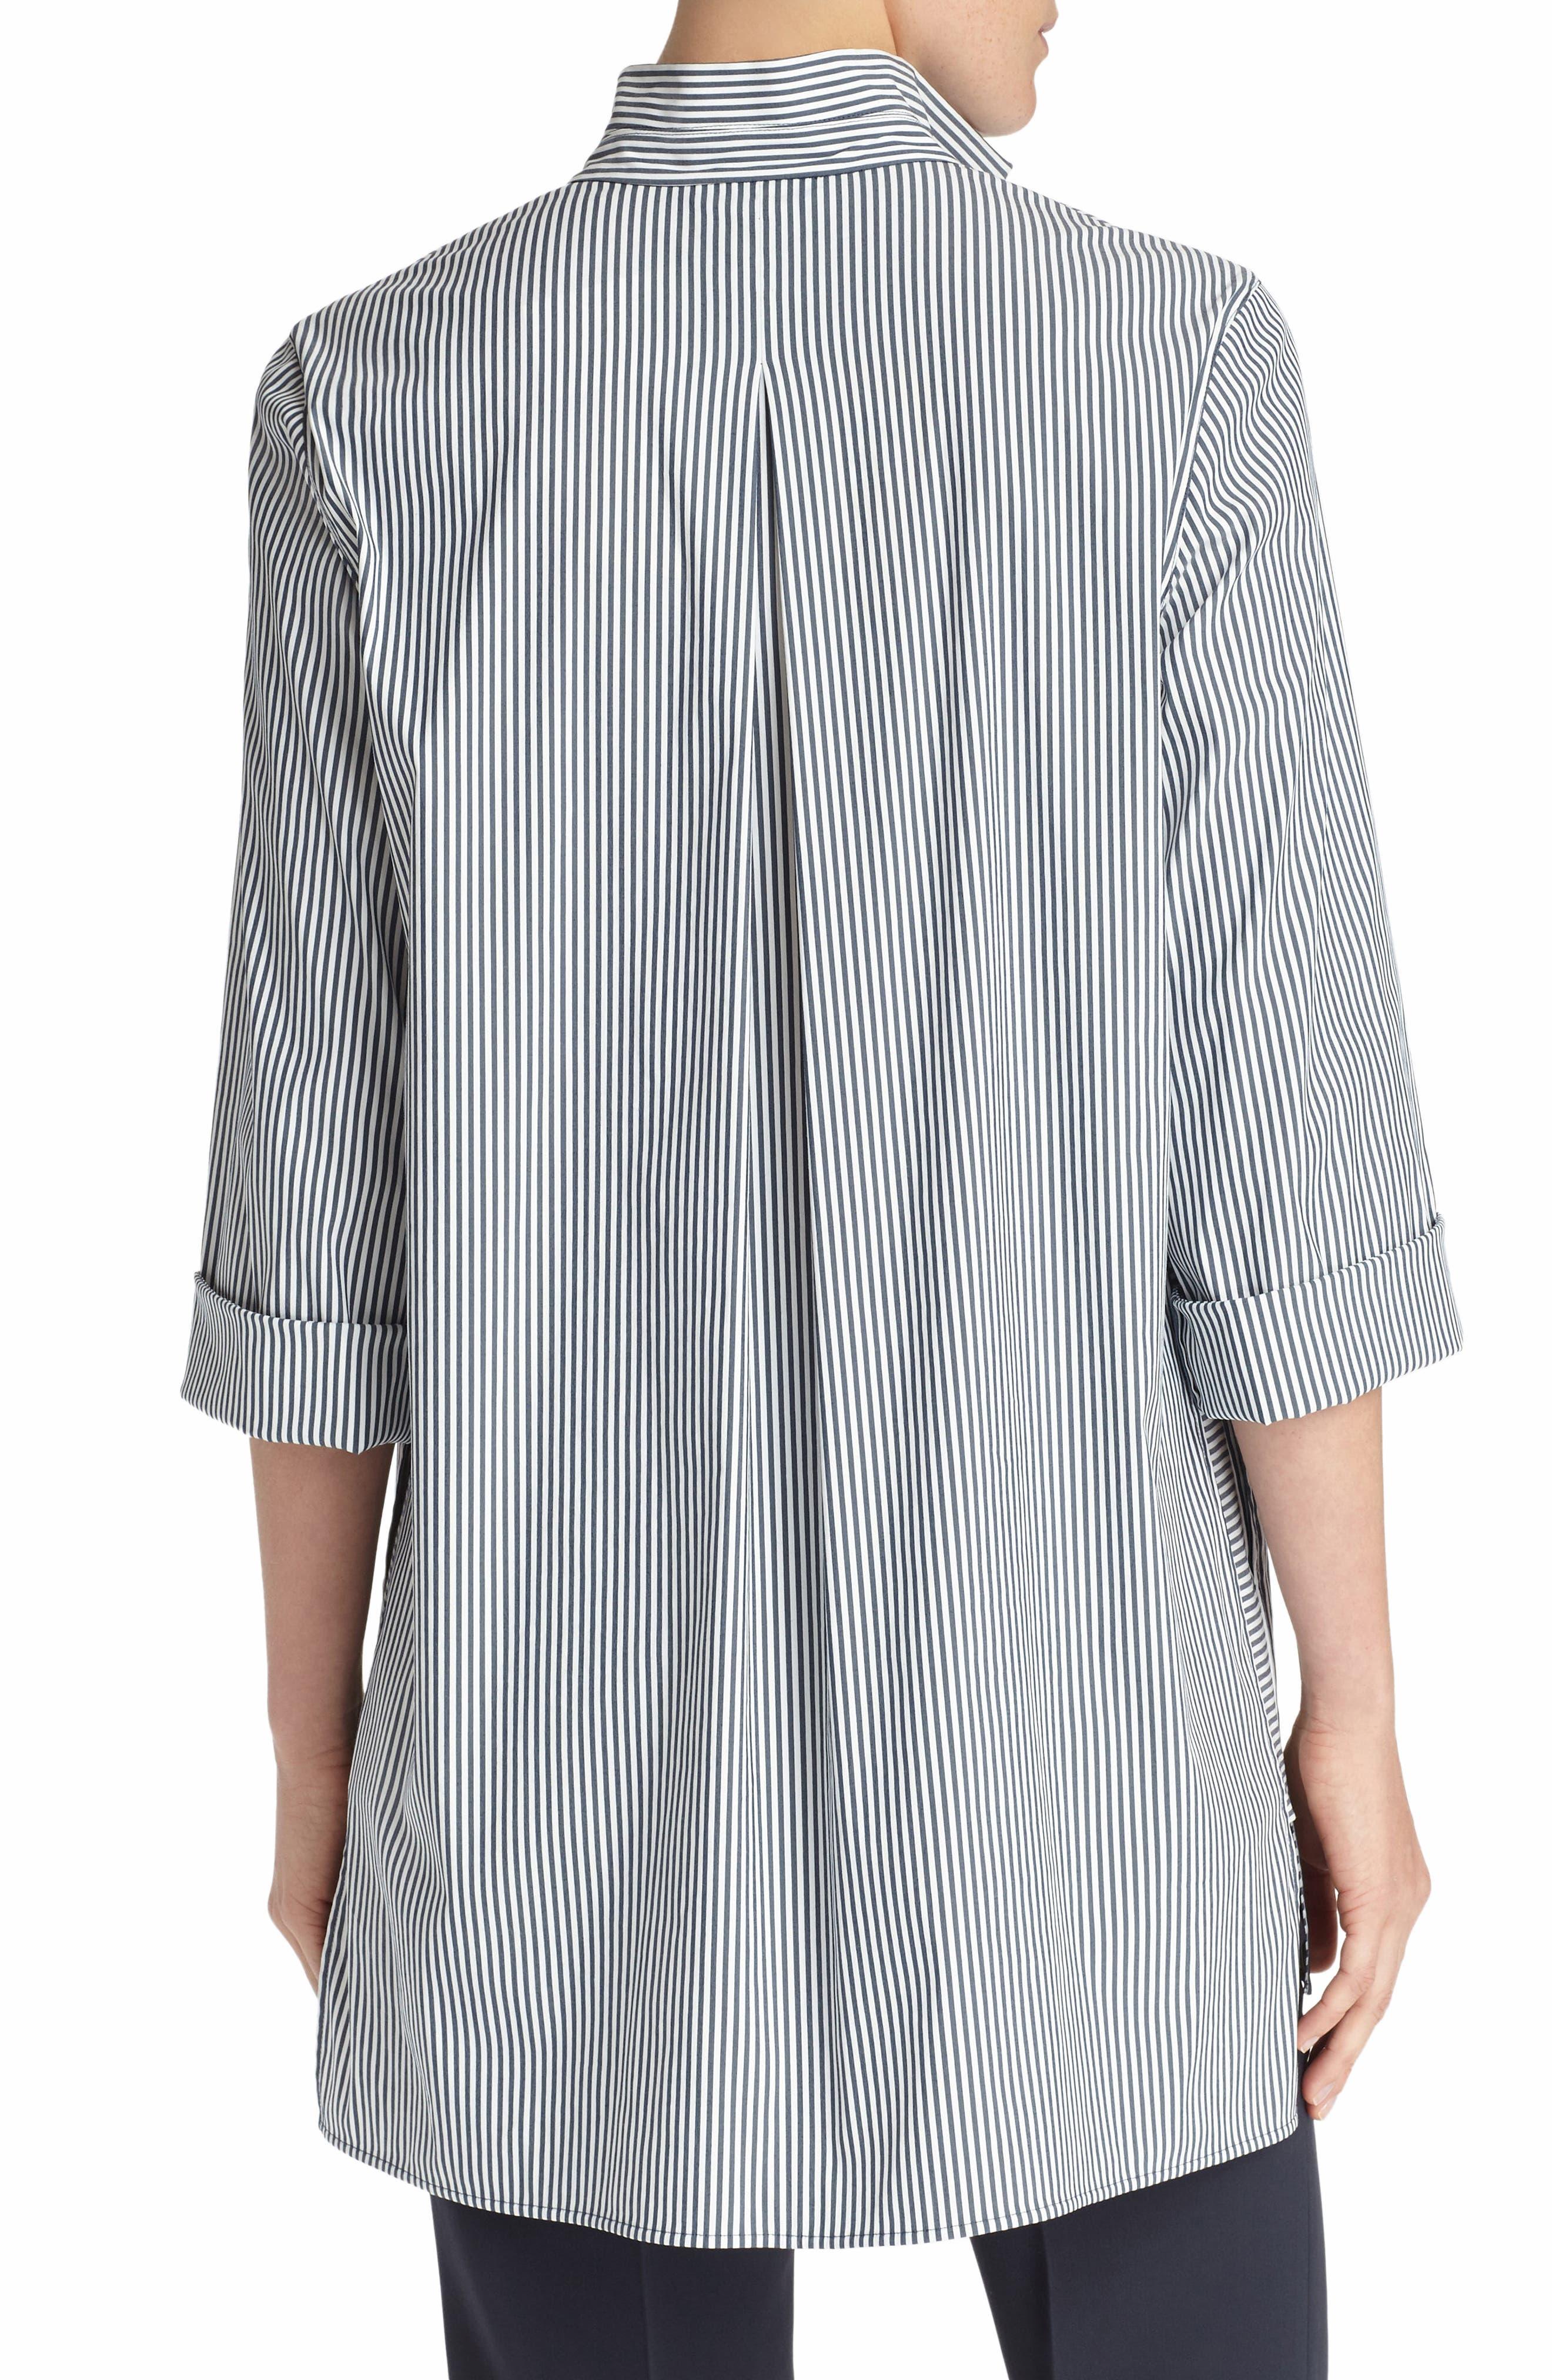 Desirae Freeport Stripe Shirting Blouse,                             Alternate thumbnail 2, color,                             Admiral Blue Multi